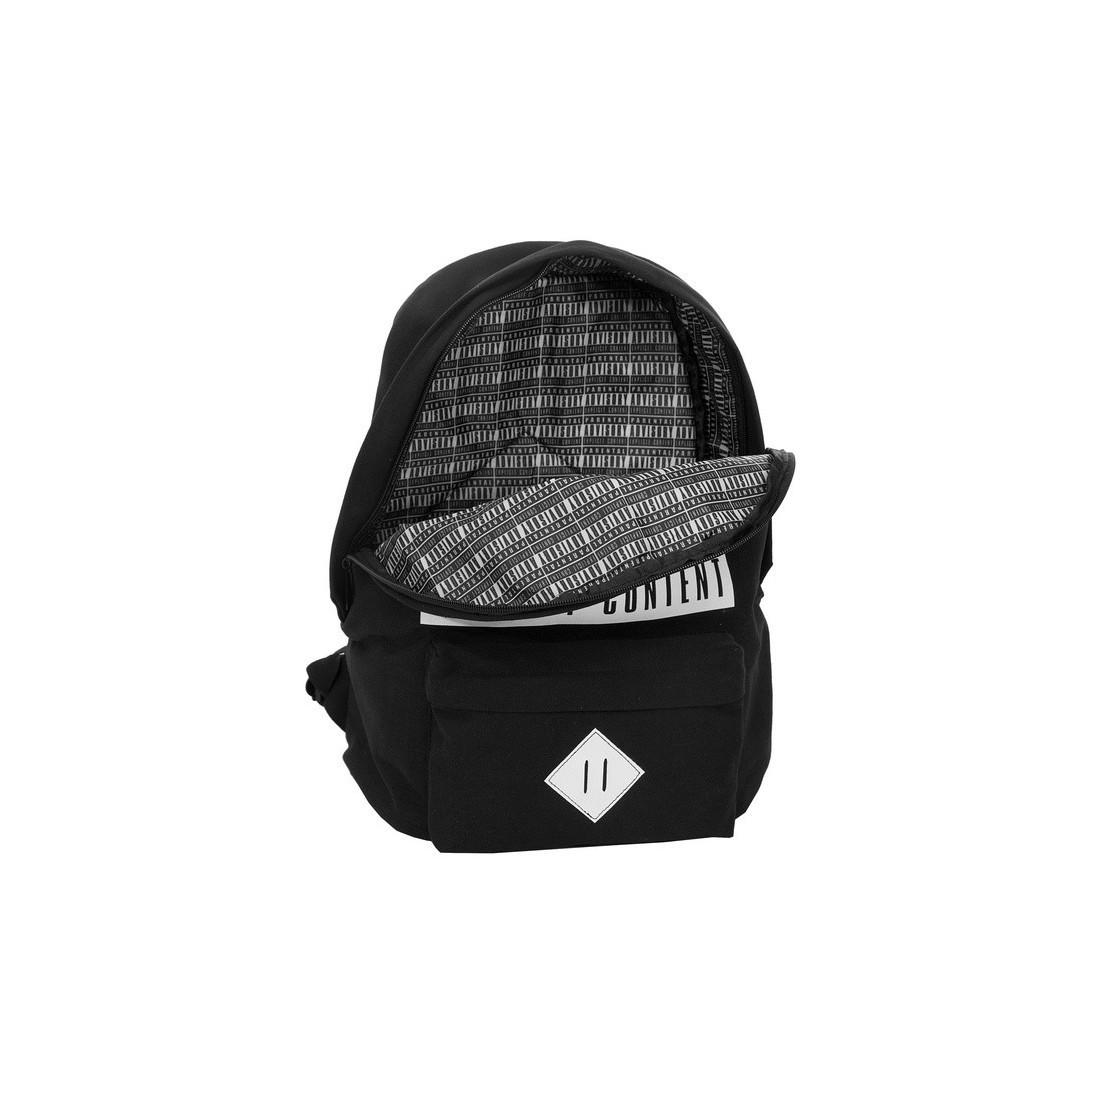 Plecak młodzieżowy Canvas Parental Advisory - plecak-tornister.pl